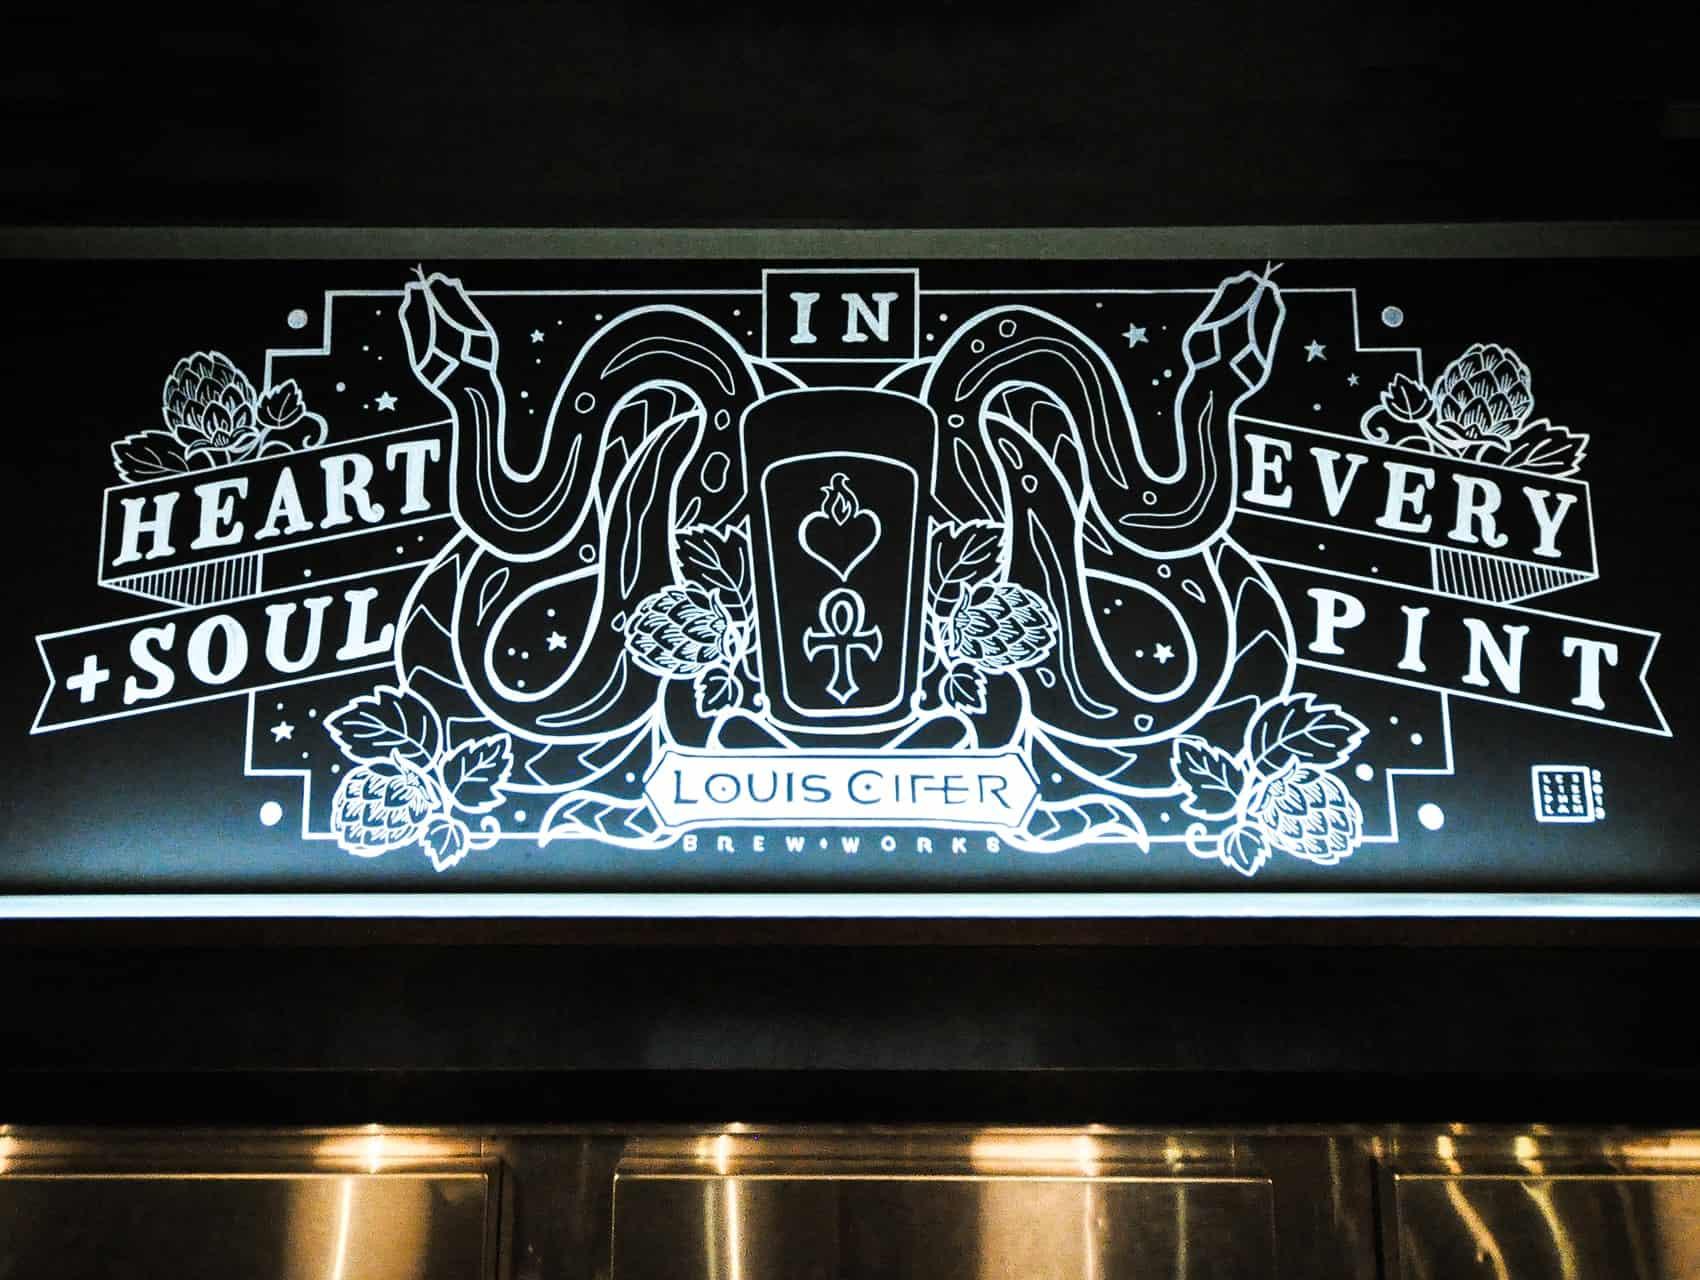 toronto beer cider brewery mural art